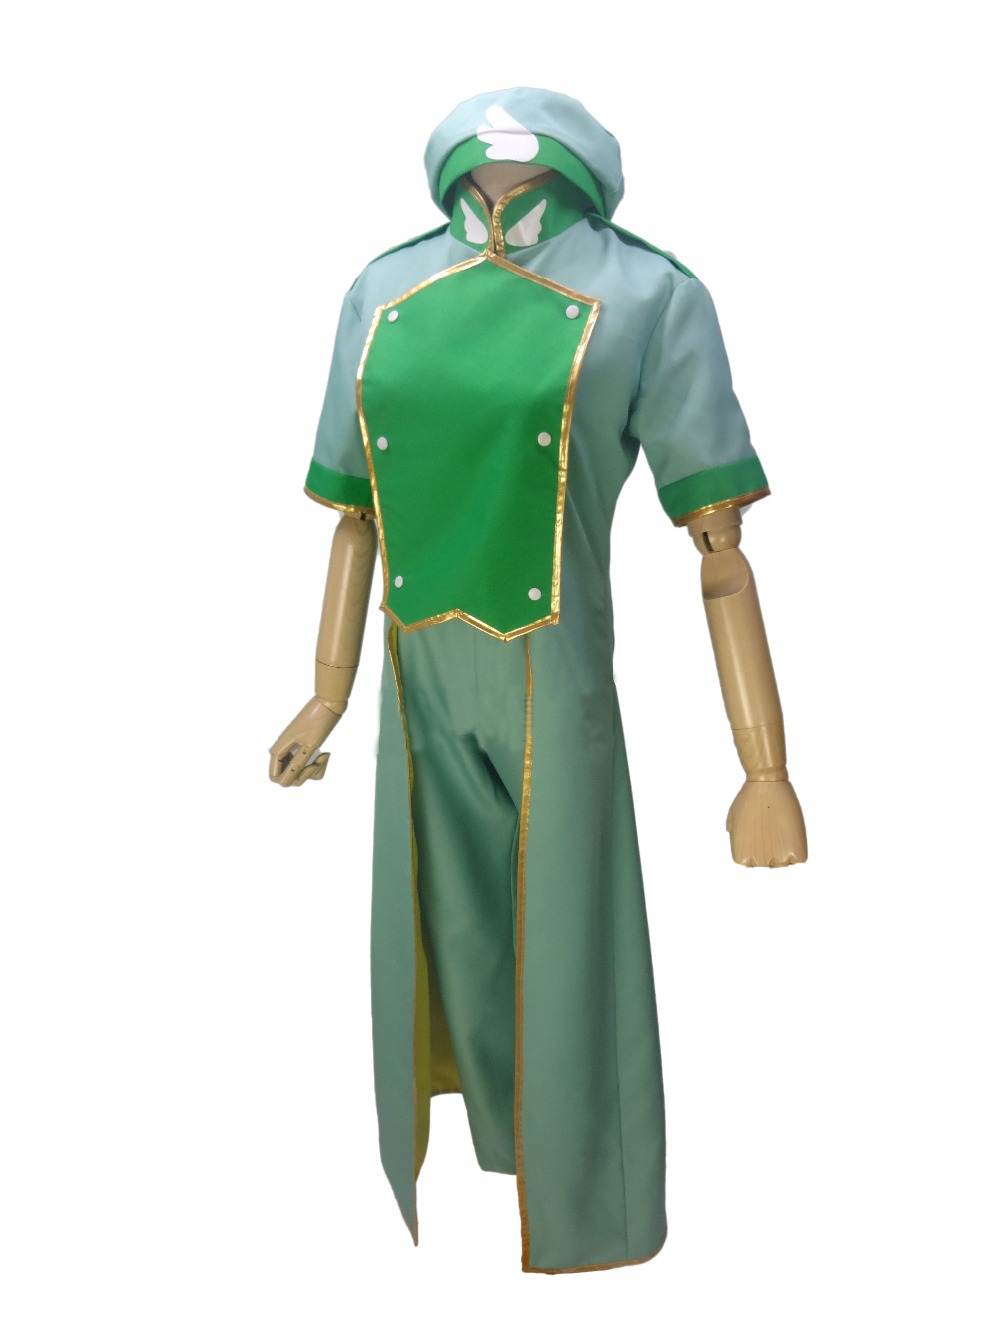 Tenue uniforme verte Sakura Syaoran Li Showron 2018